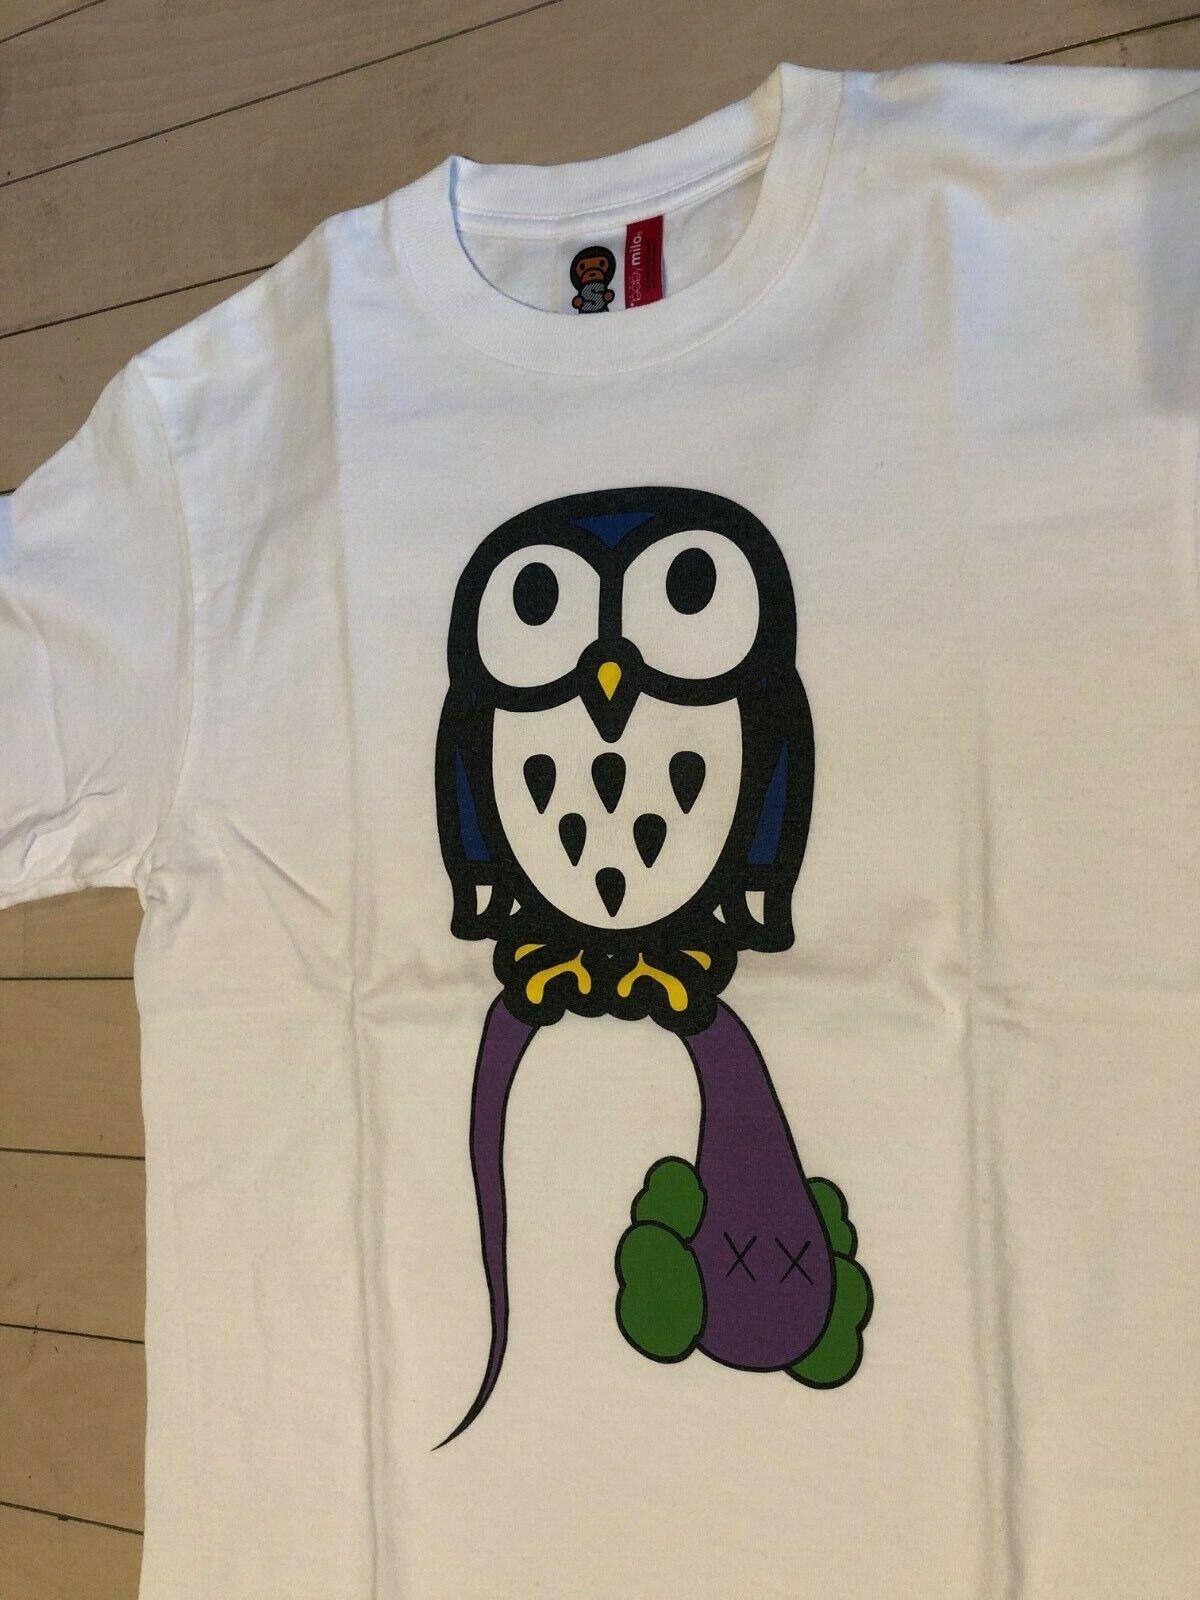 677ddd8be264f A Bape x Kaws x Baby Milo Owl OVO T-Shirt Tee size S small Bathing Ape  nnshar7896-T-Shirts